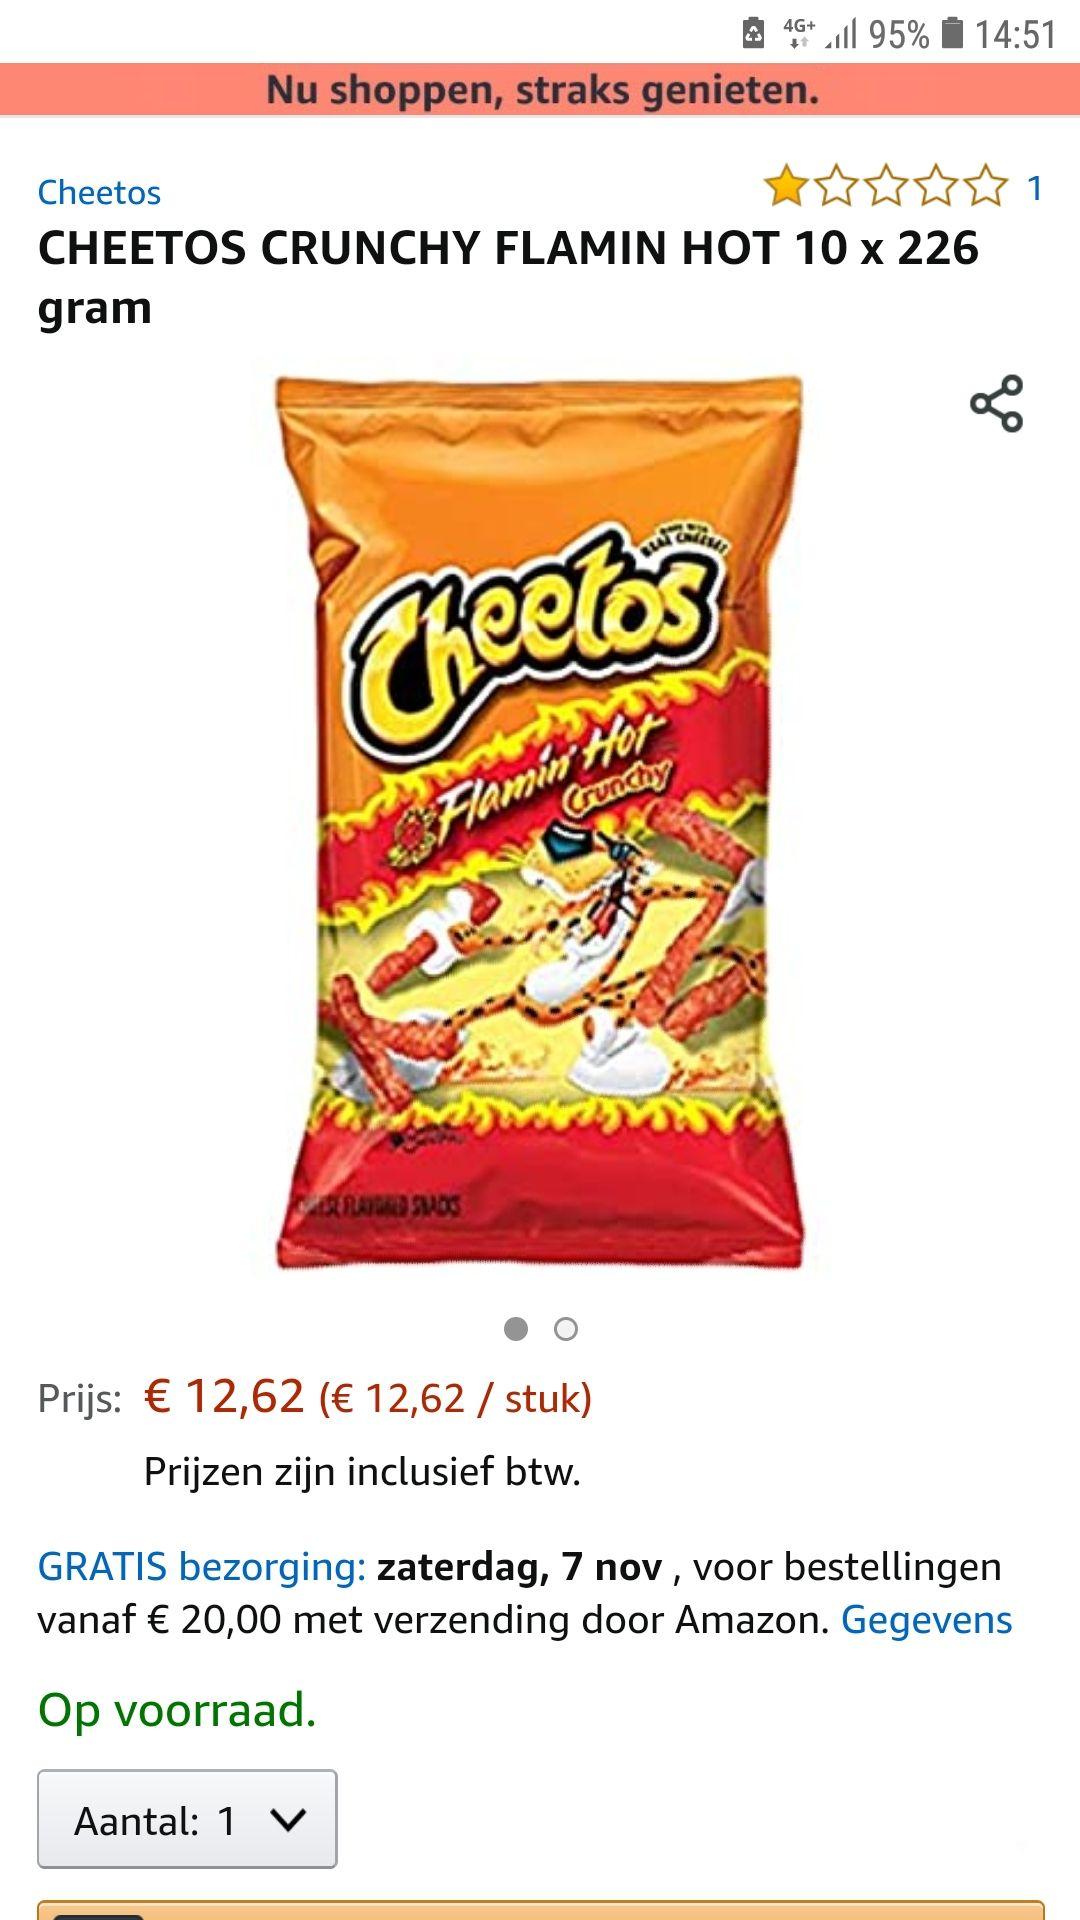 Flaming hot cheetos 10stuks van 226 gram